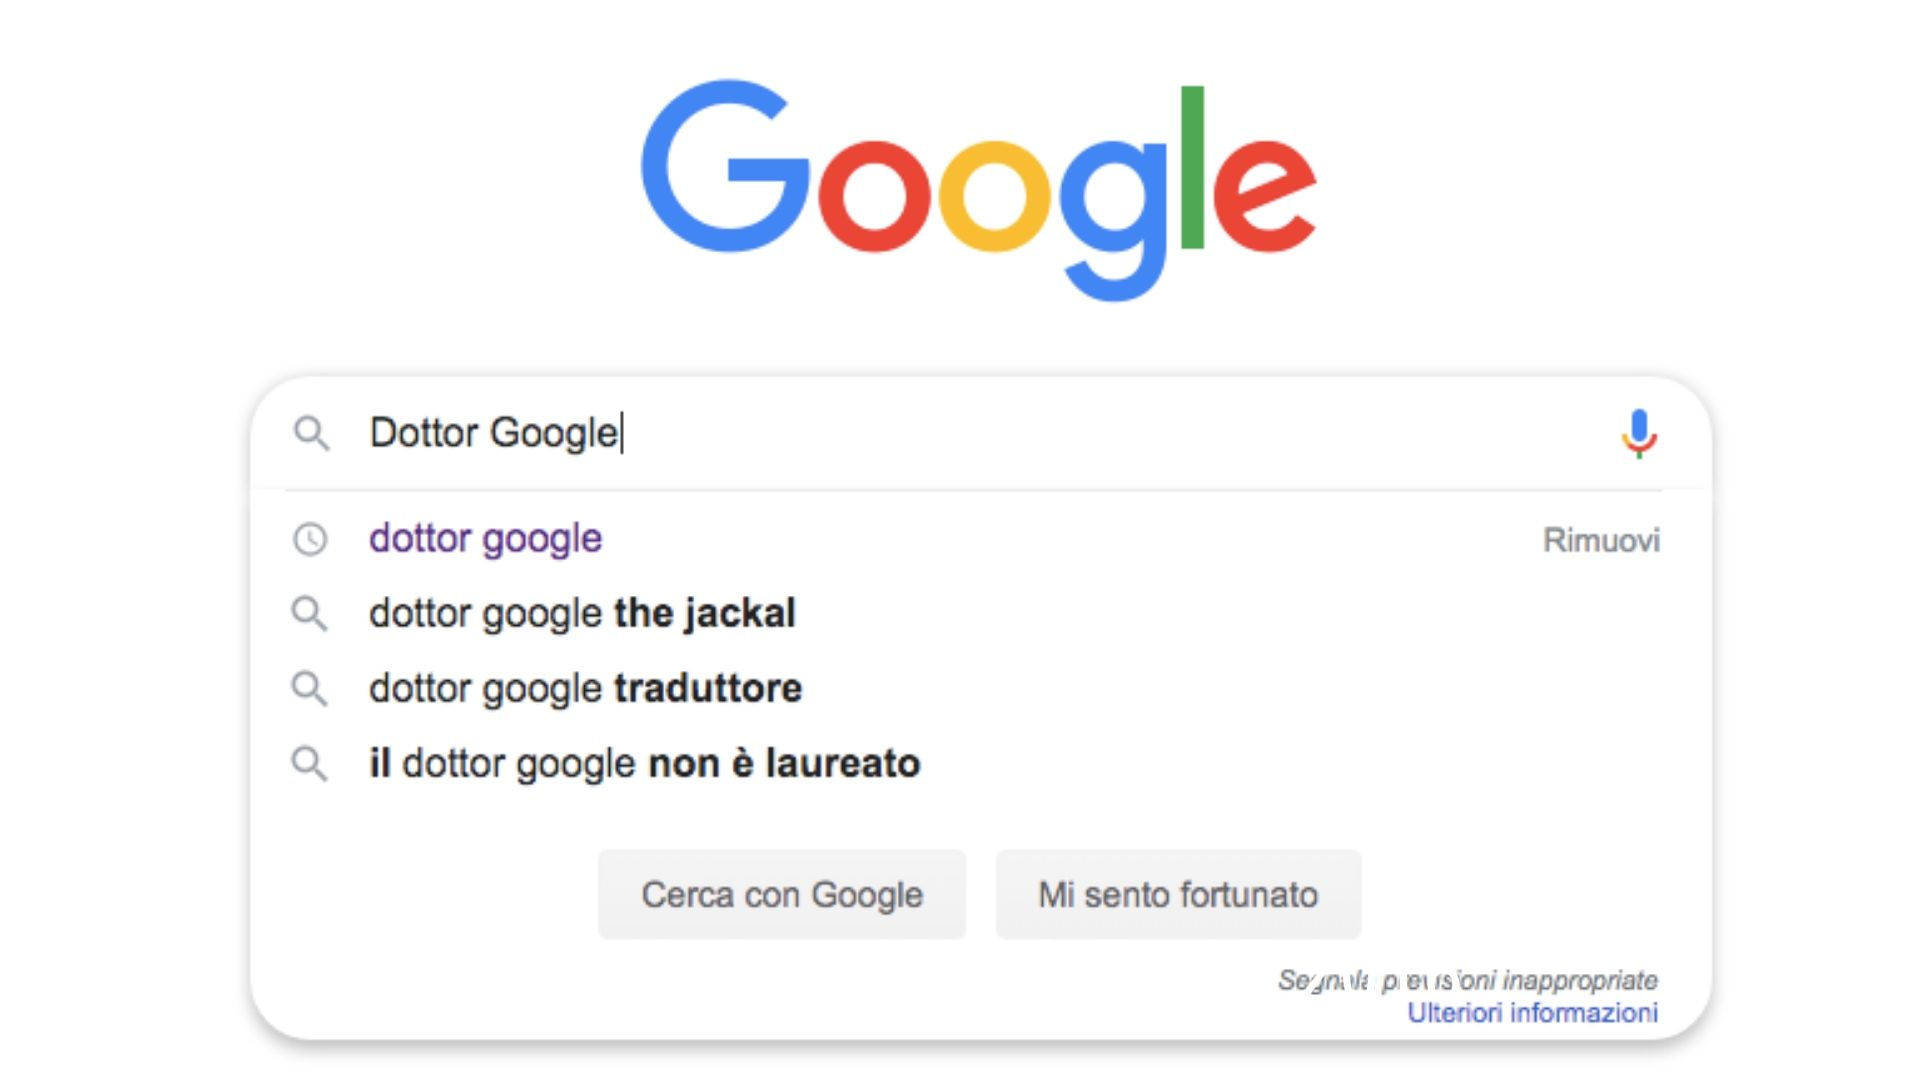 Dottor Google the Jackal